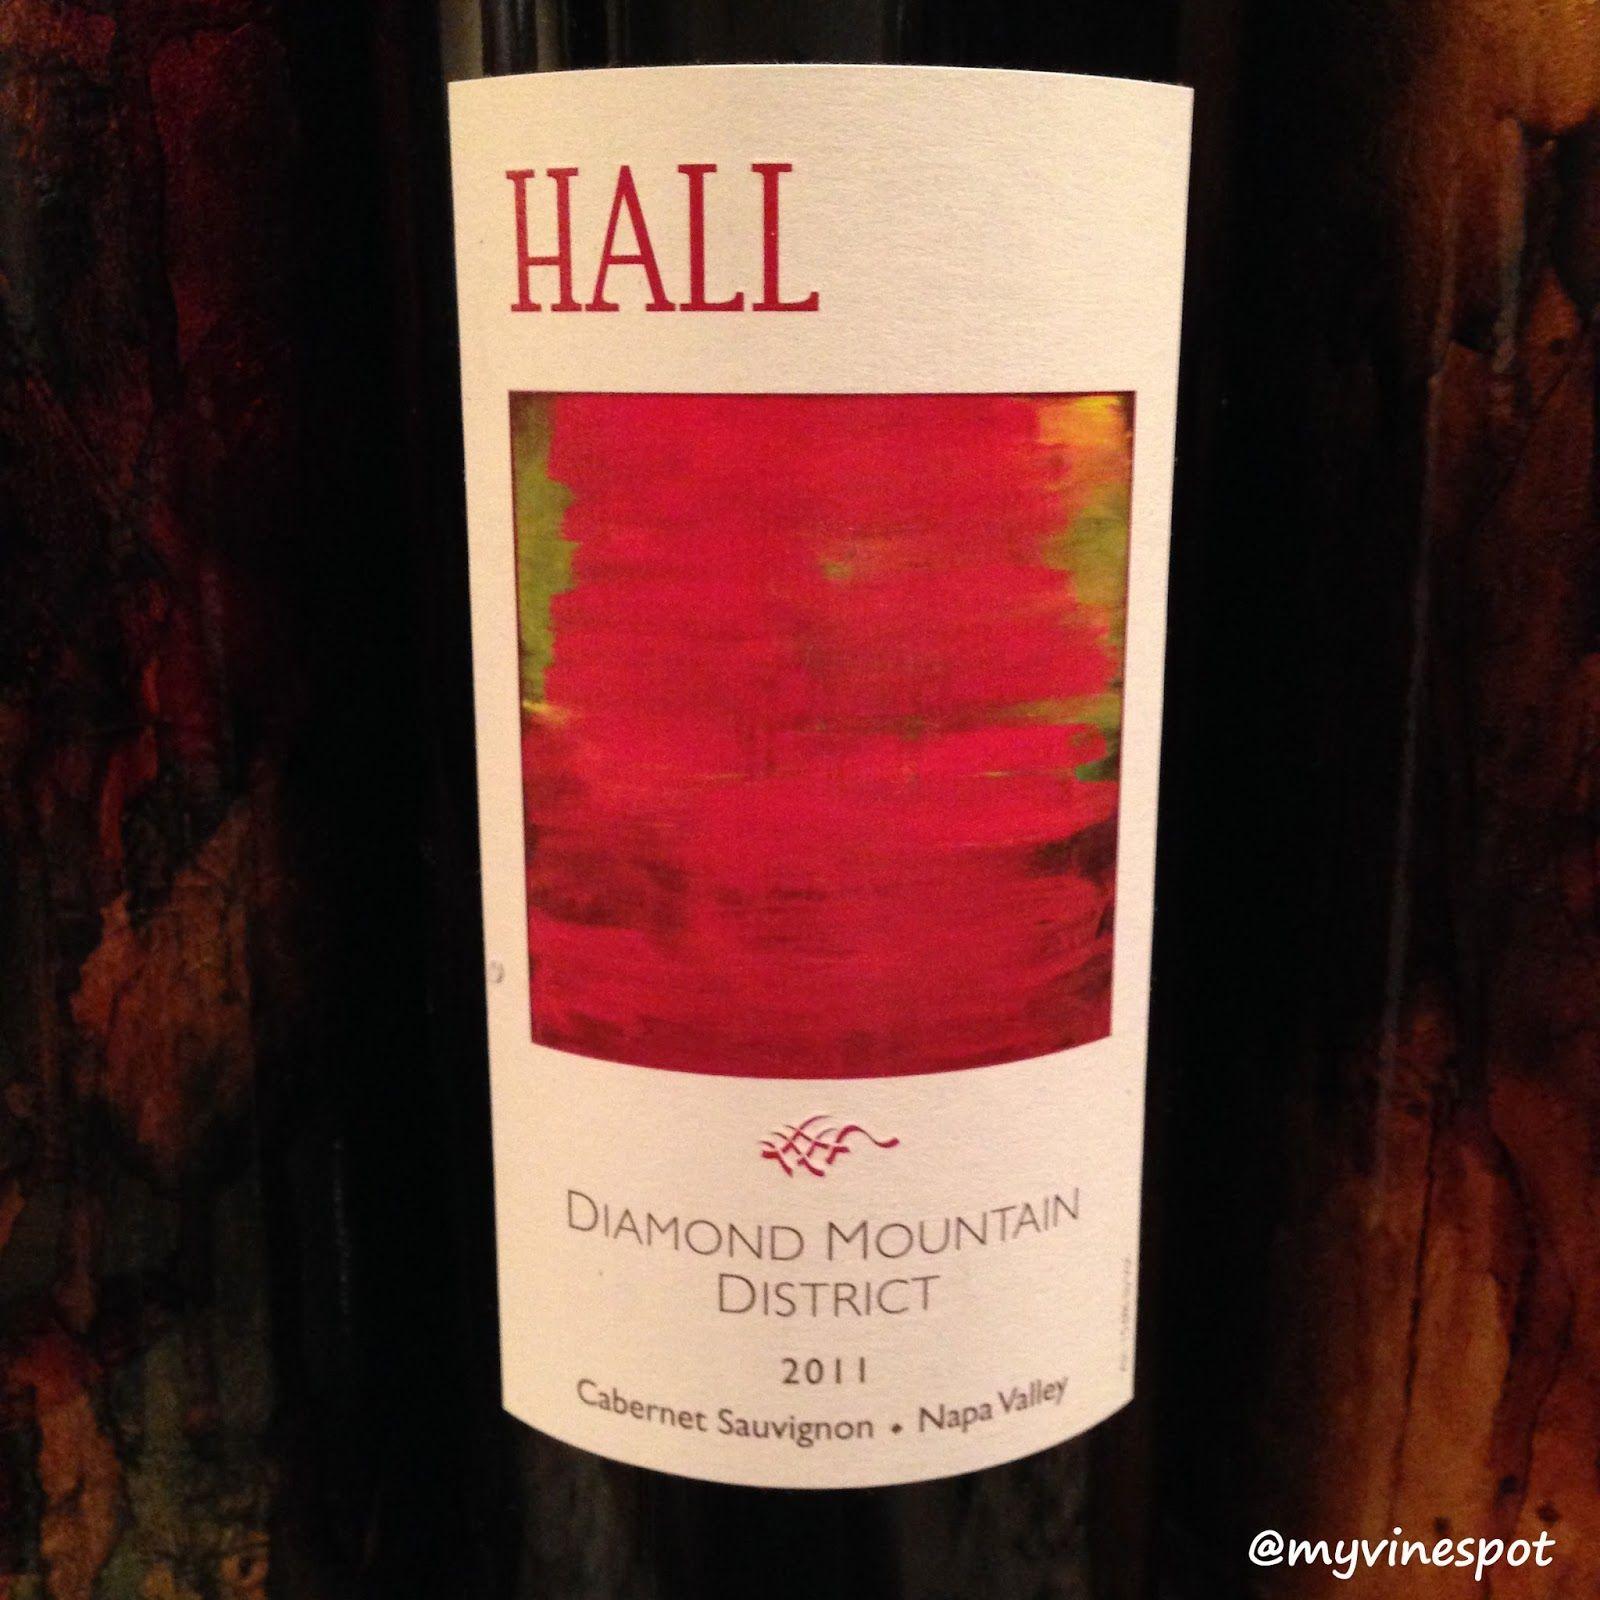 Quick Sip Hall Wines 2011 Diamond Mountain District Cabernet Sauvignon Wine Bottle Carrier Berry Fruit Wine Bottle